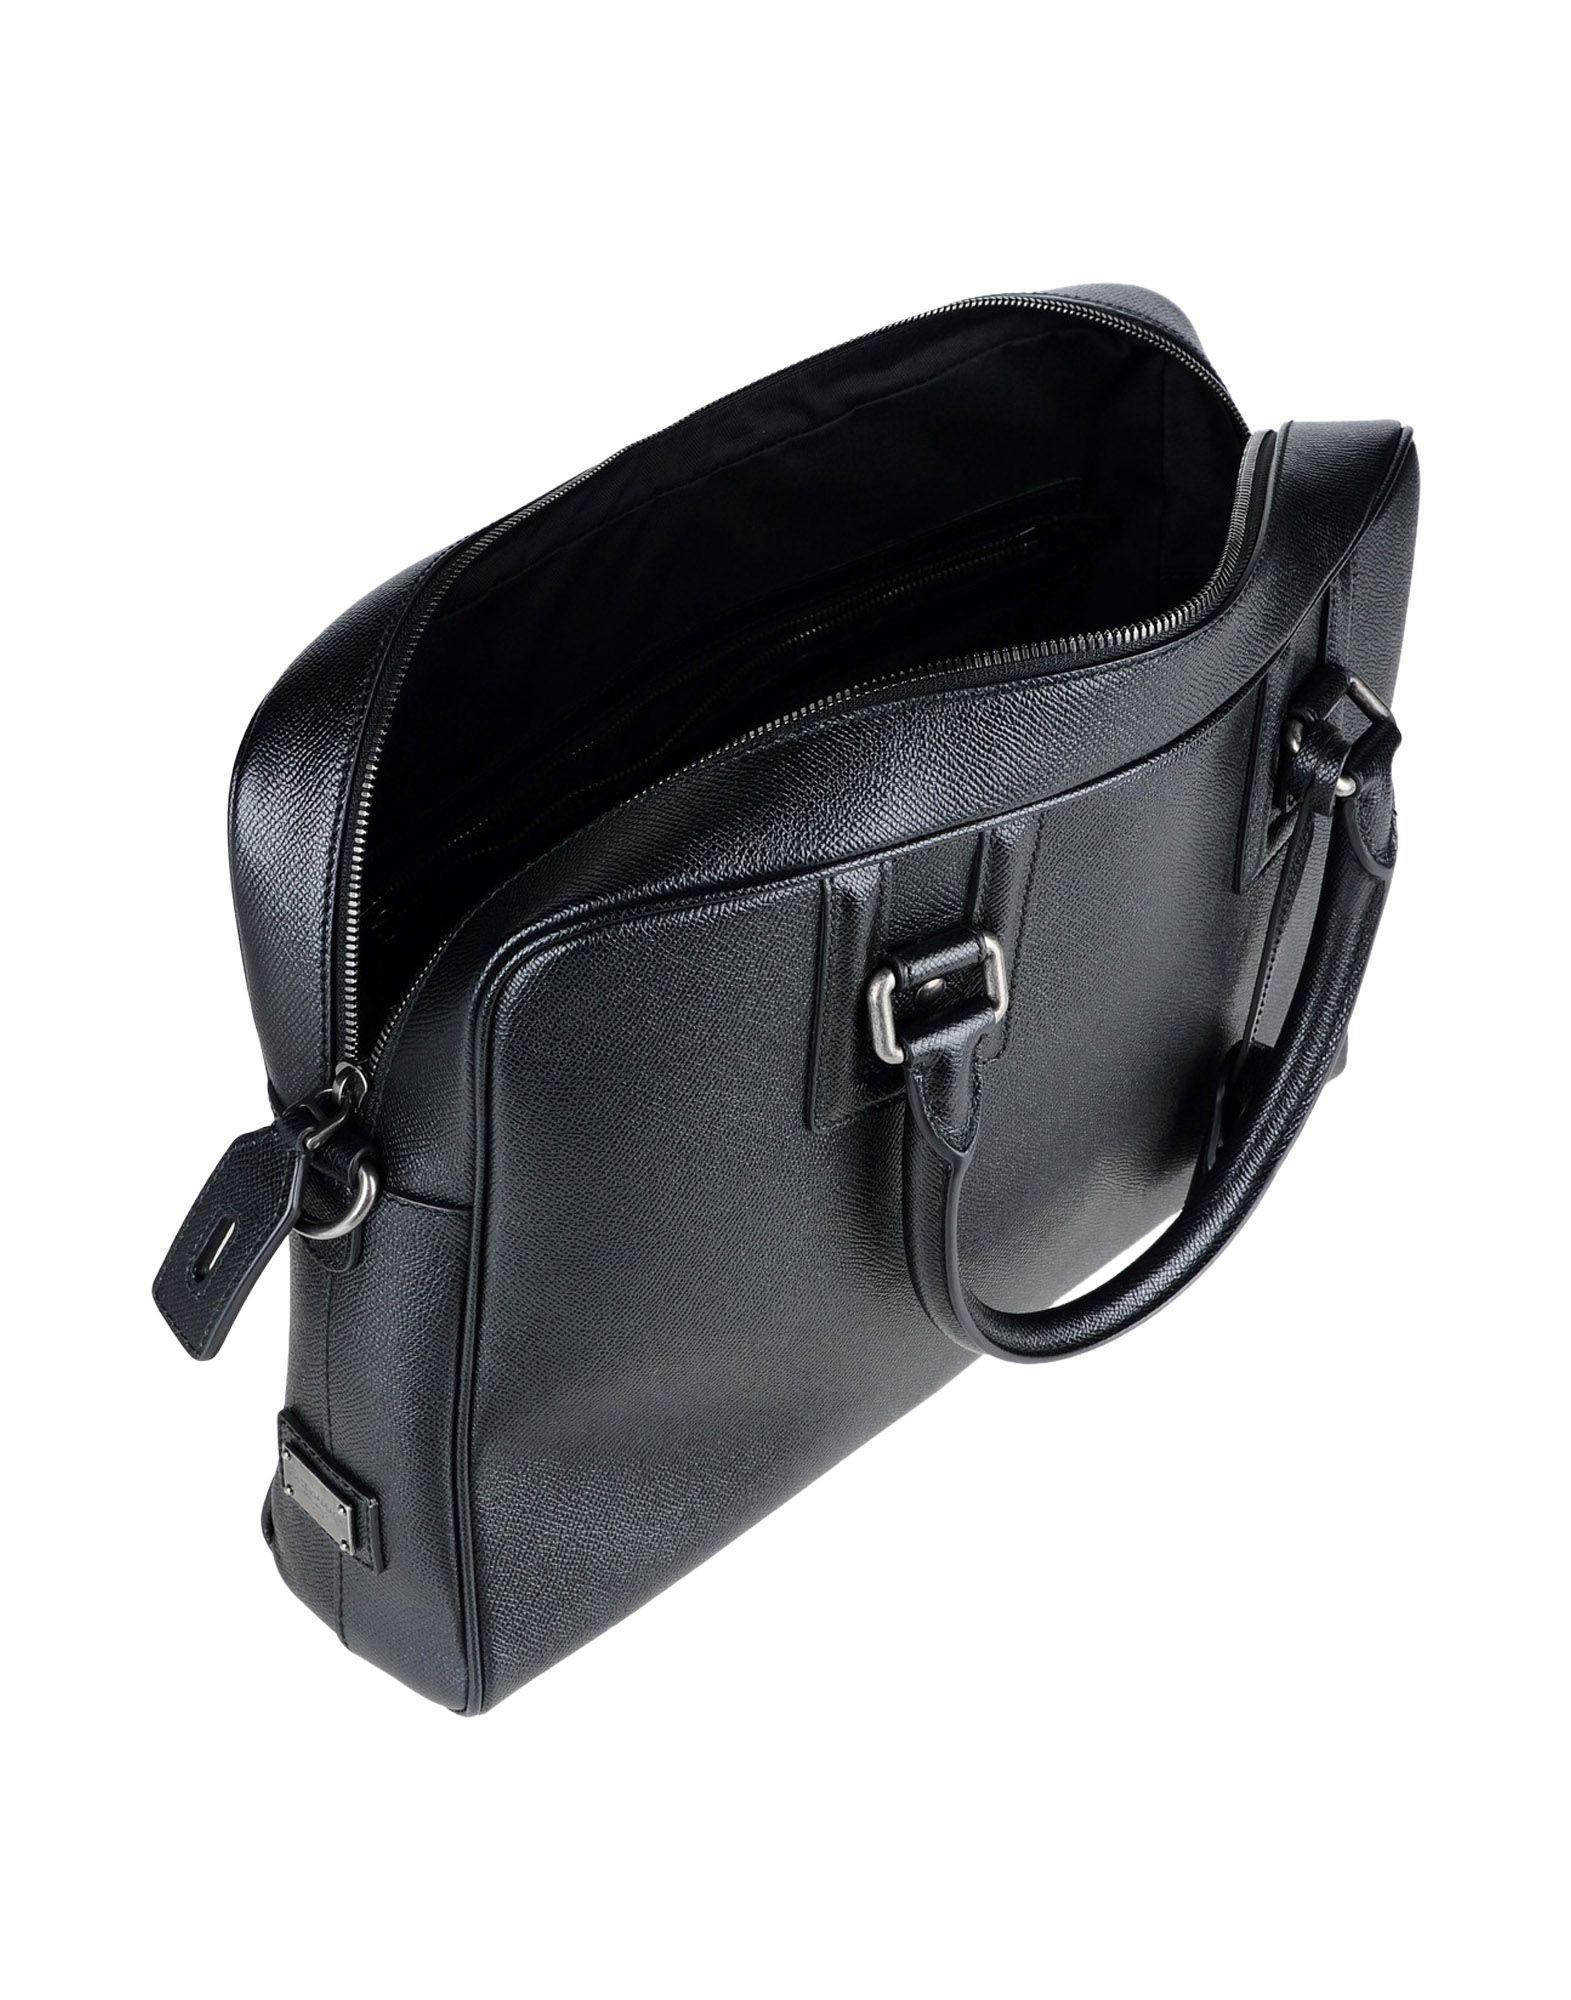 Lyst - Dolce   Gabbana Work Bags in Black for Men 66b4ecad299f7